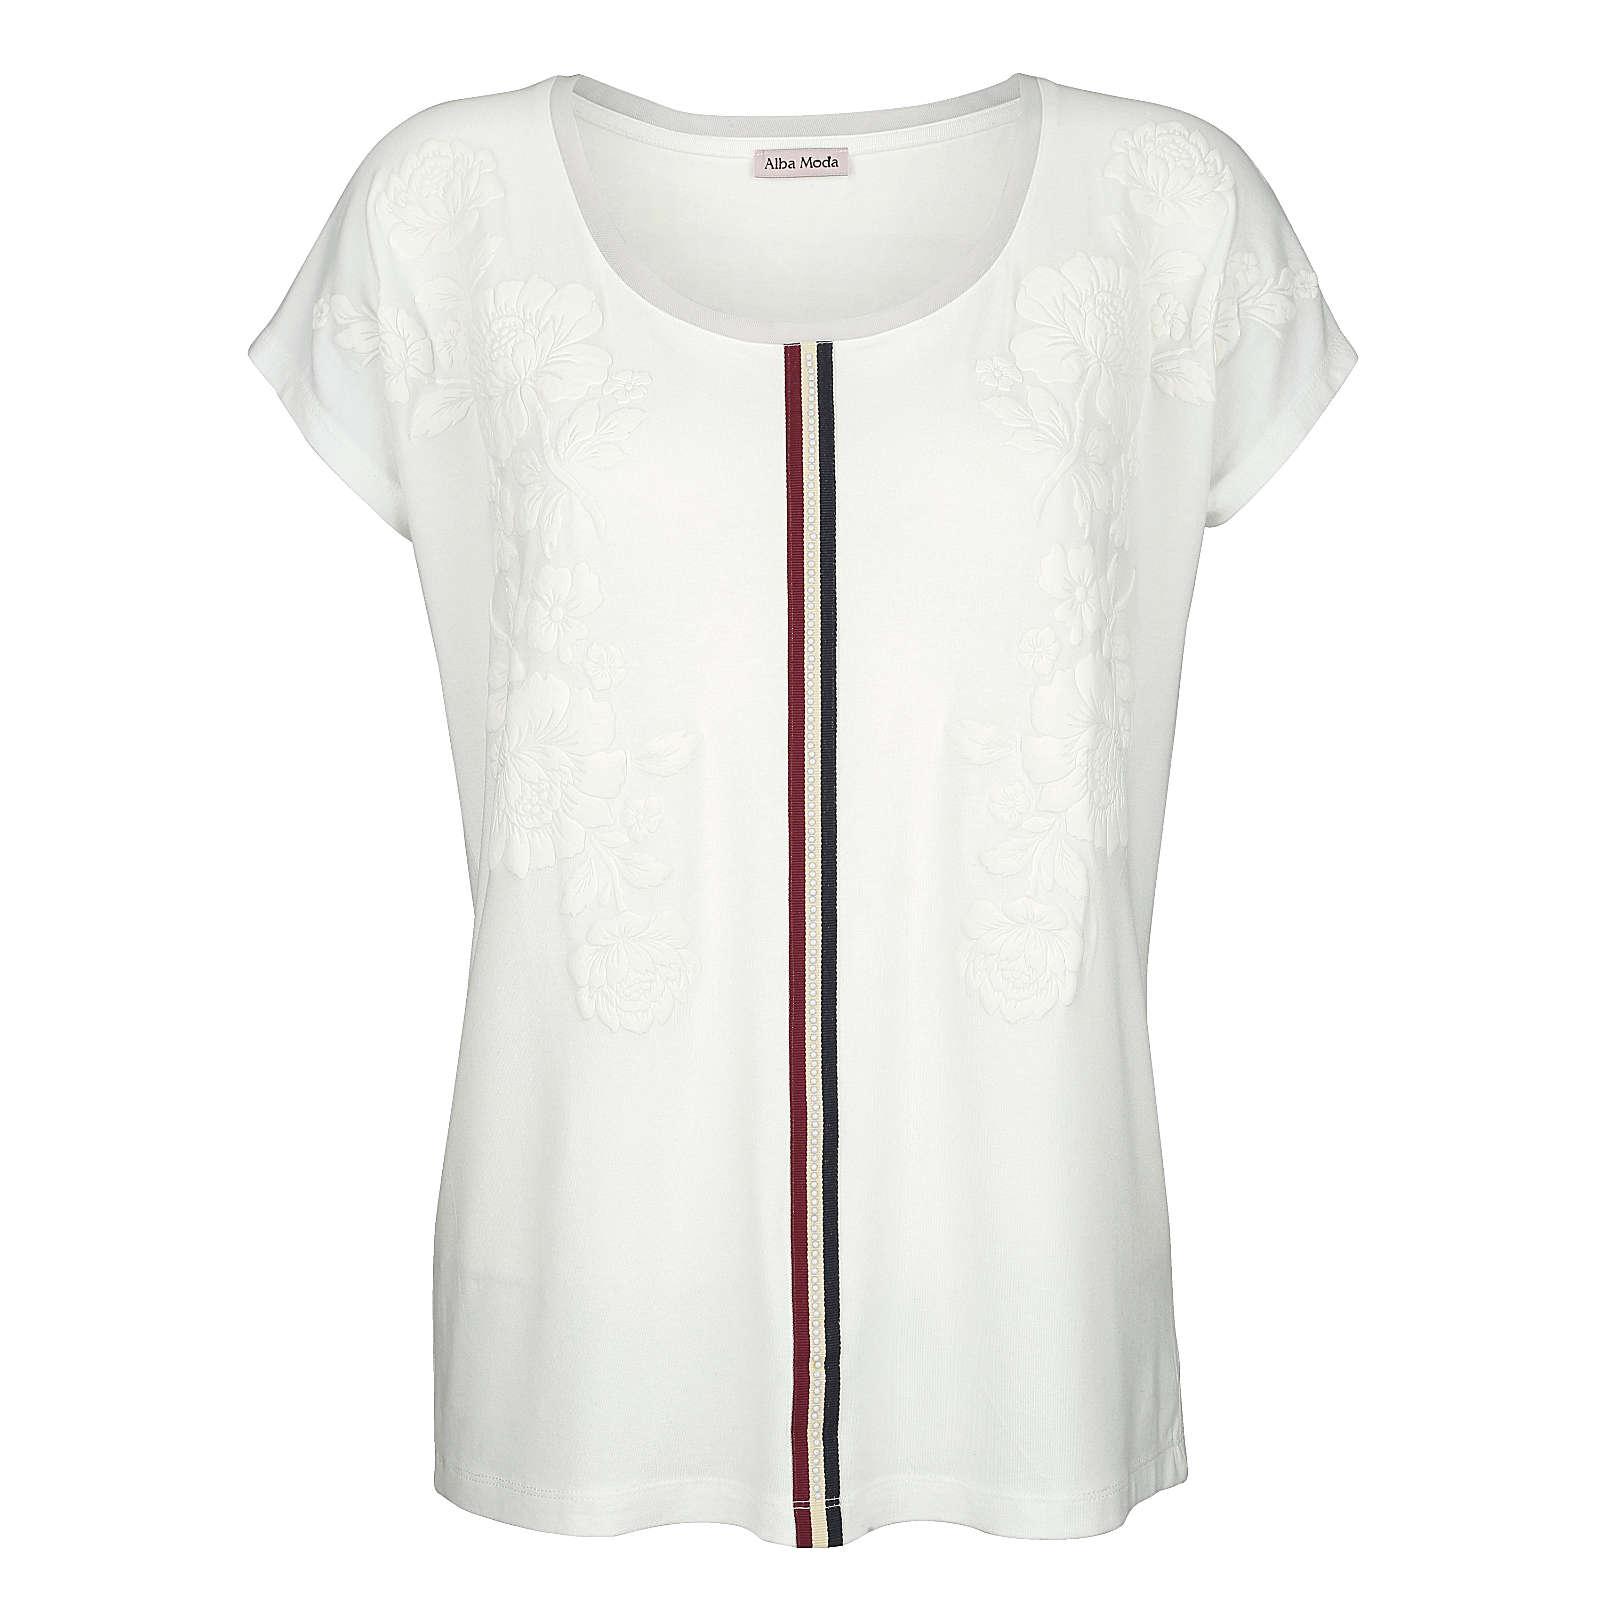 Alba Moda Shirt weiß Damen Gr. 34